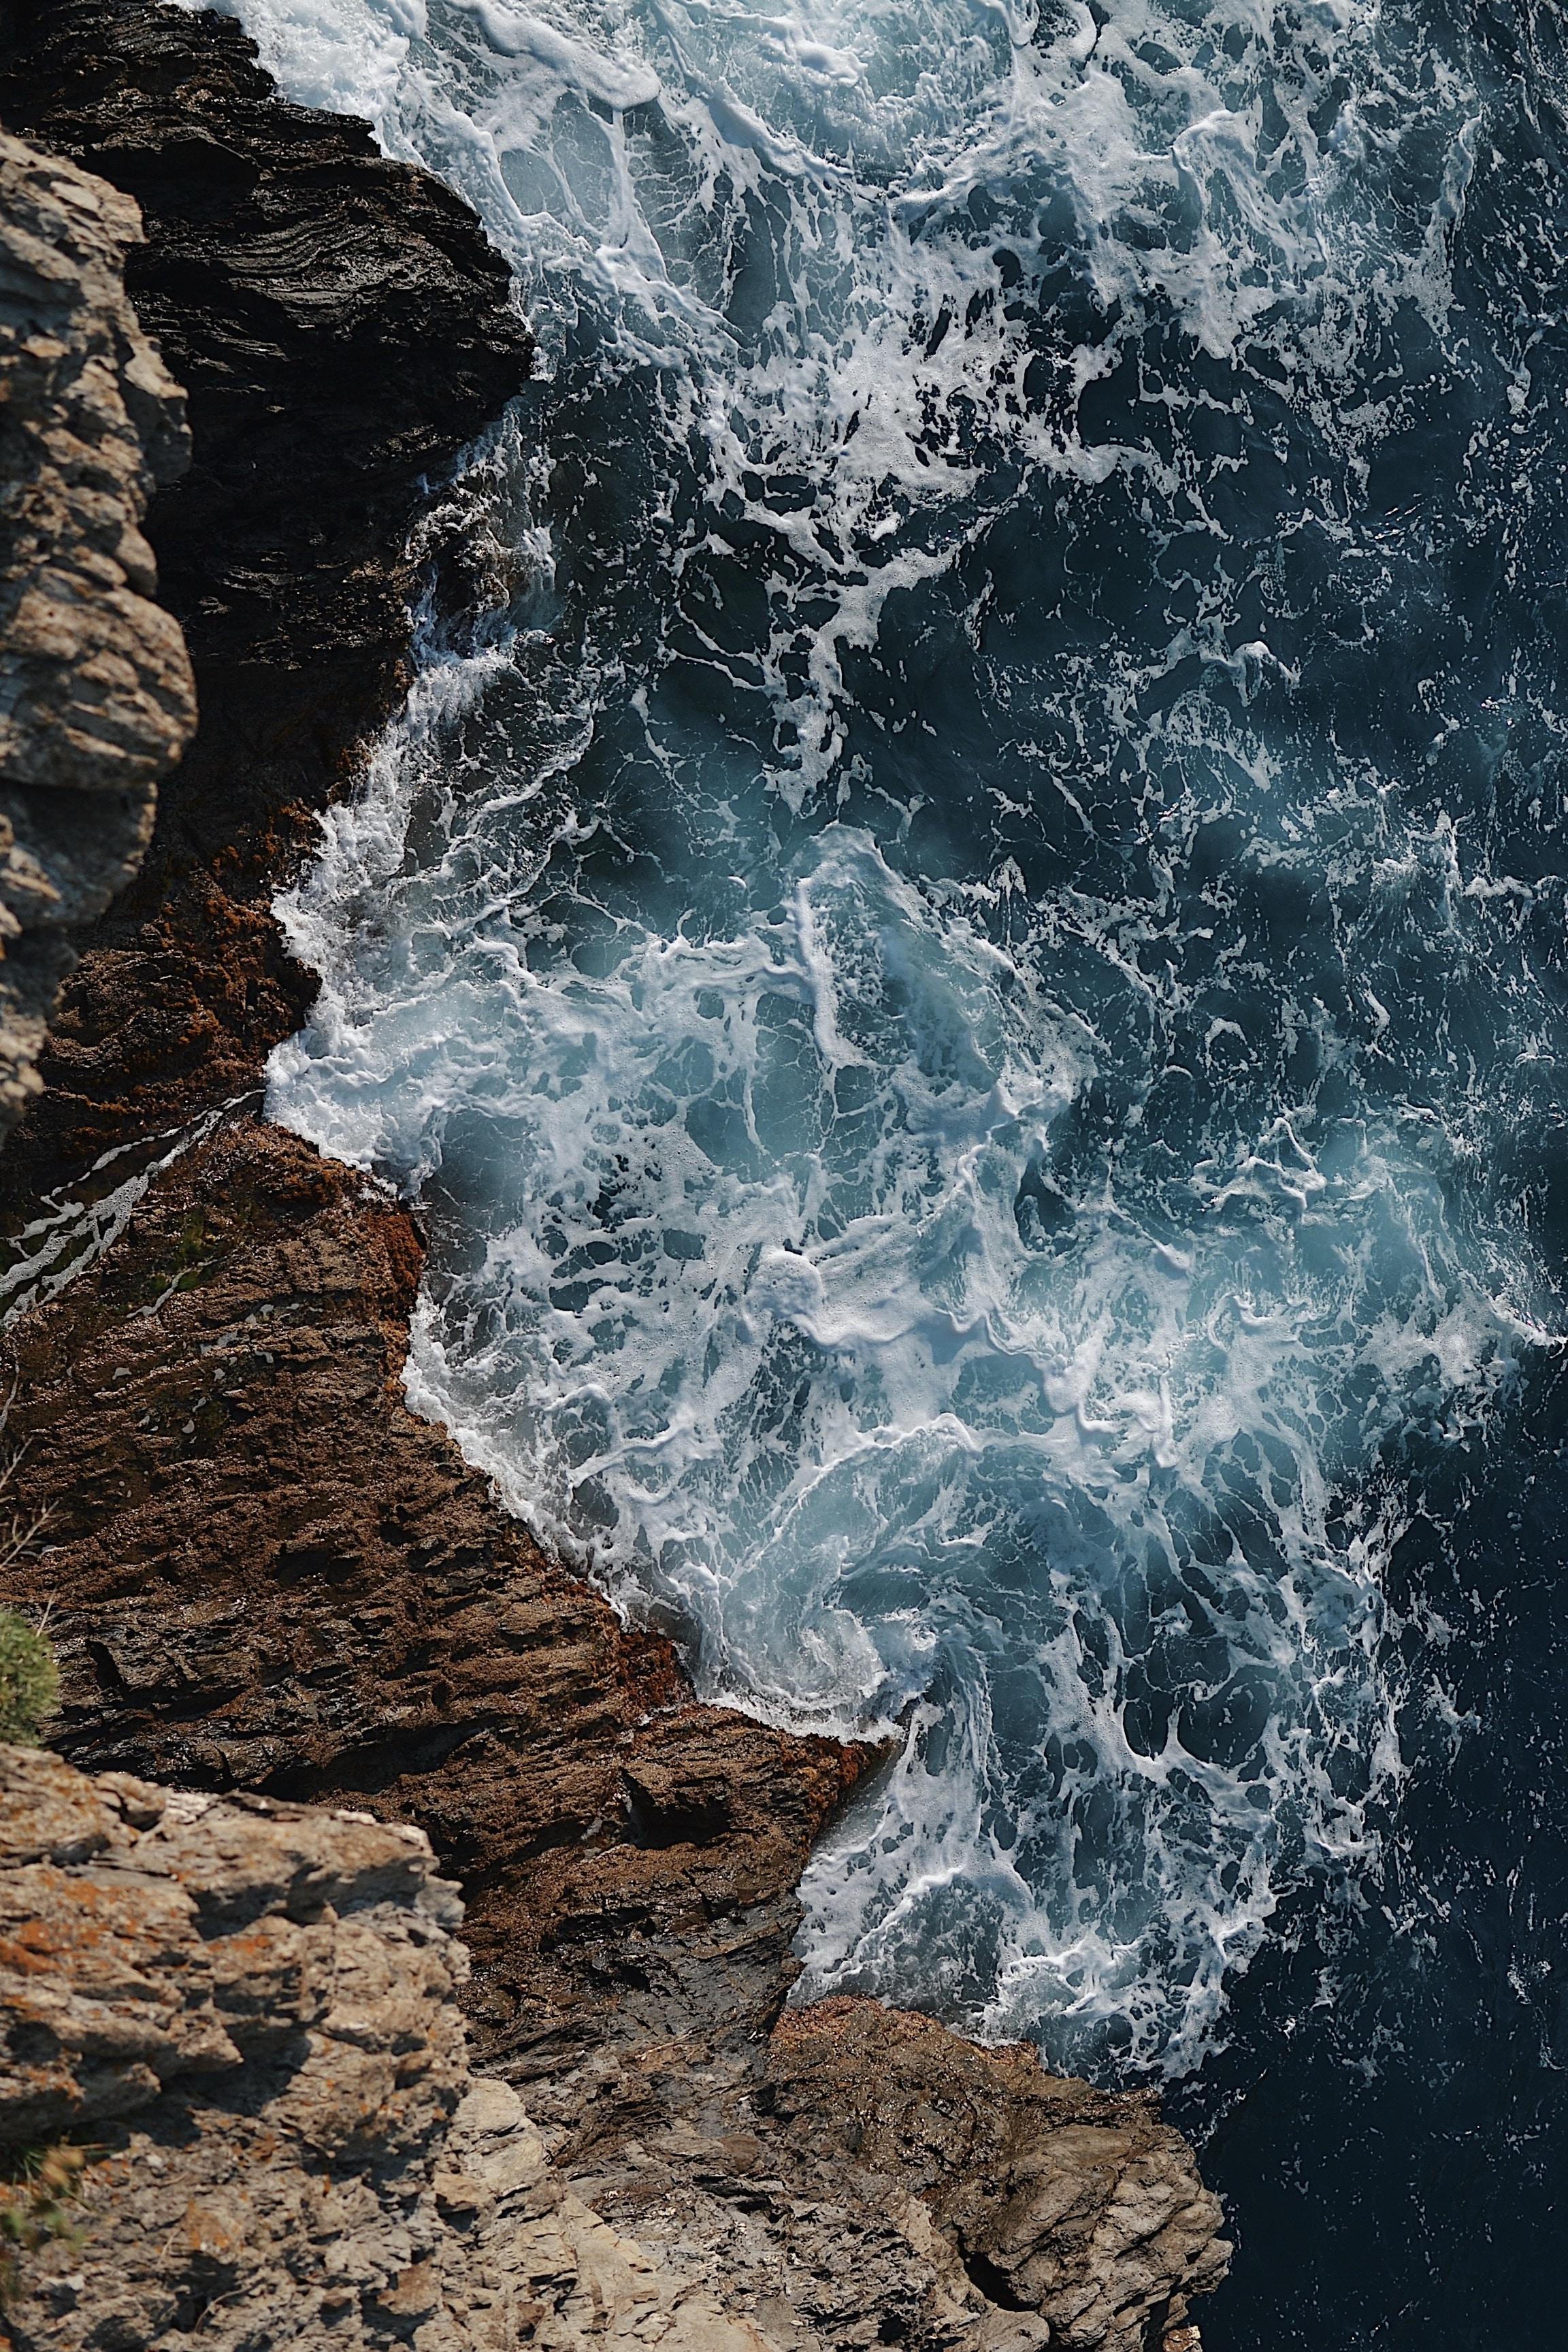 waves splashing on gray rocky cliff during daytime